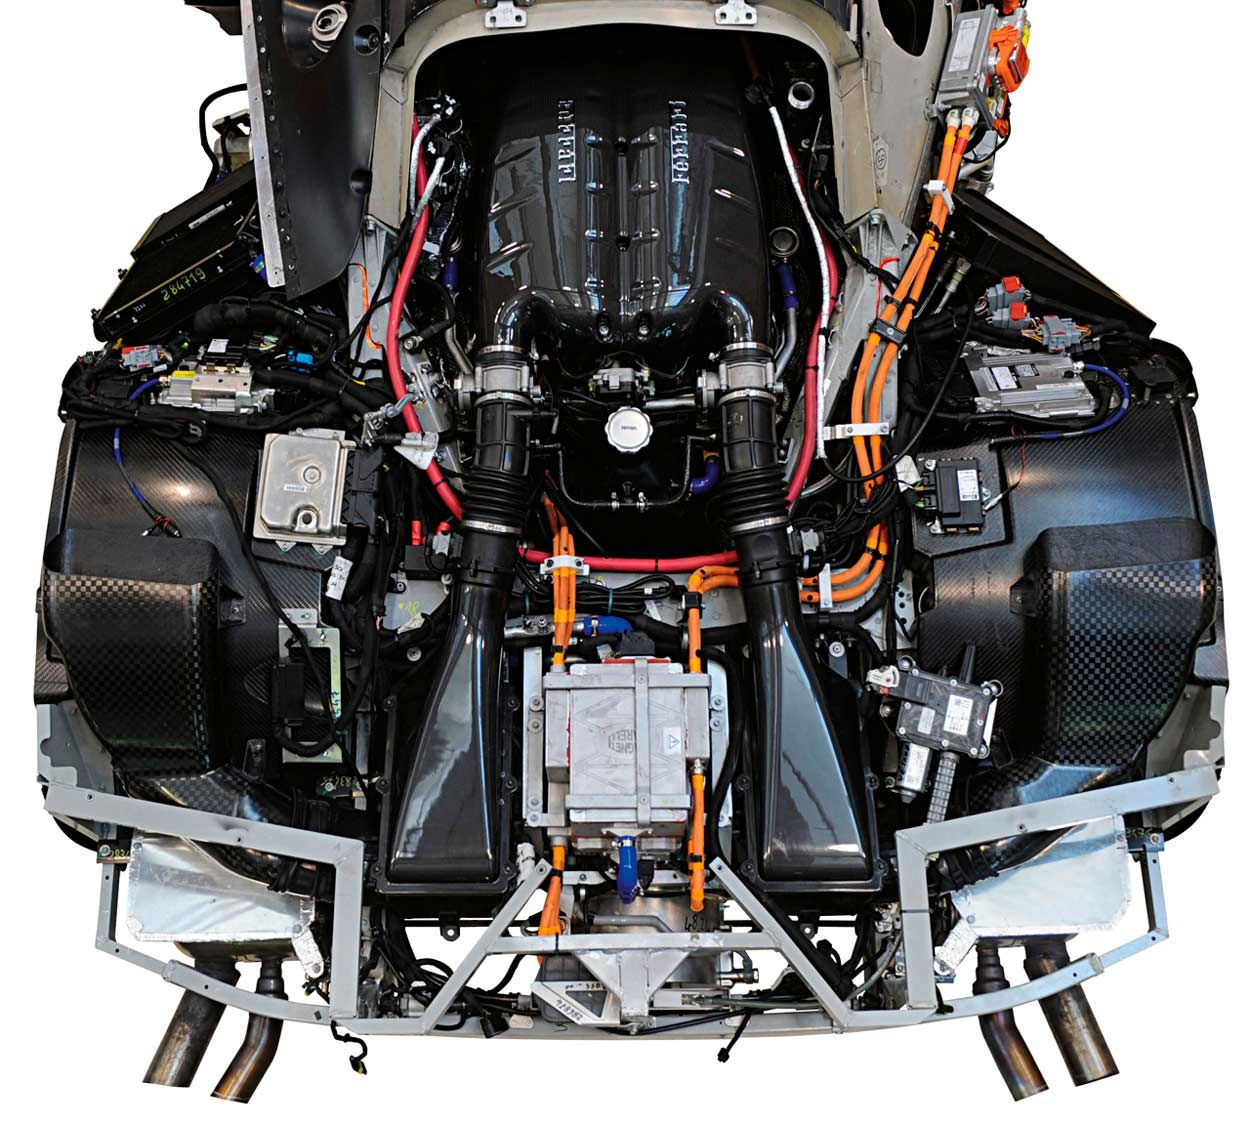 small resolution of mclaren f1 engine details cars as art mclaren ferrari cars rh pinterest com lamborghini aventador mclaren